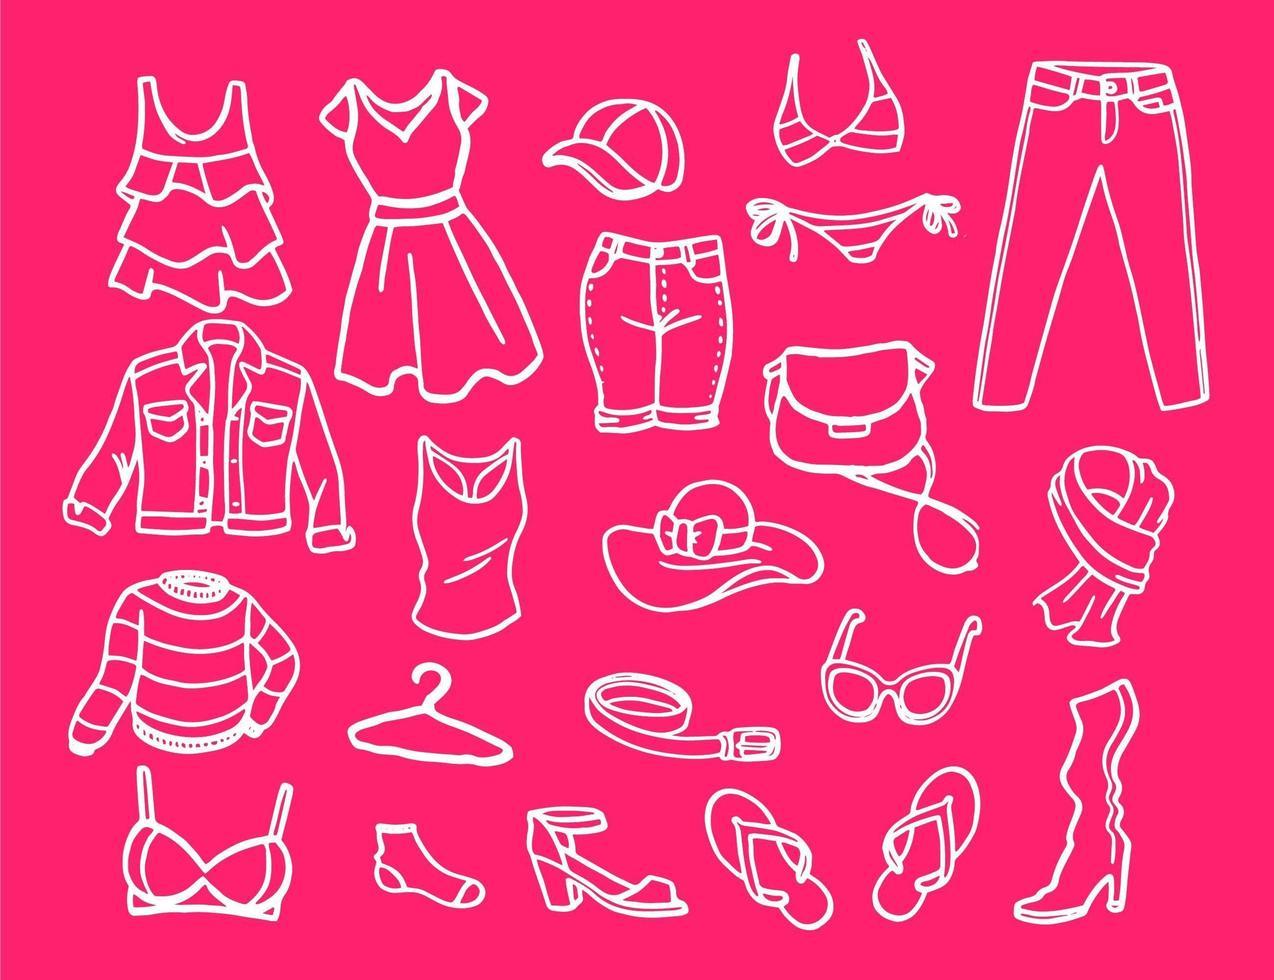 insieme di elementi di moda per le donne vettore